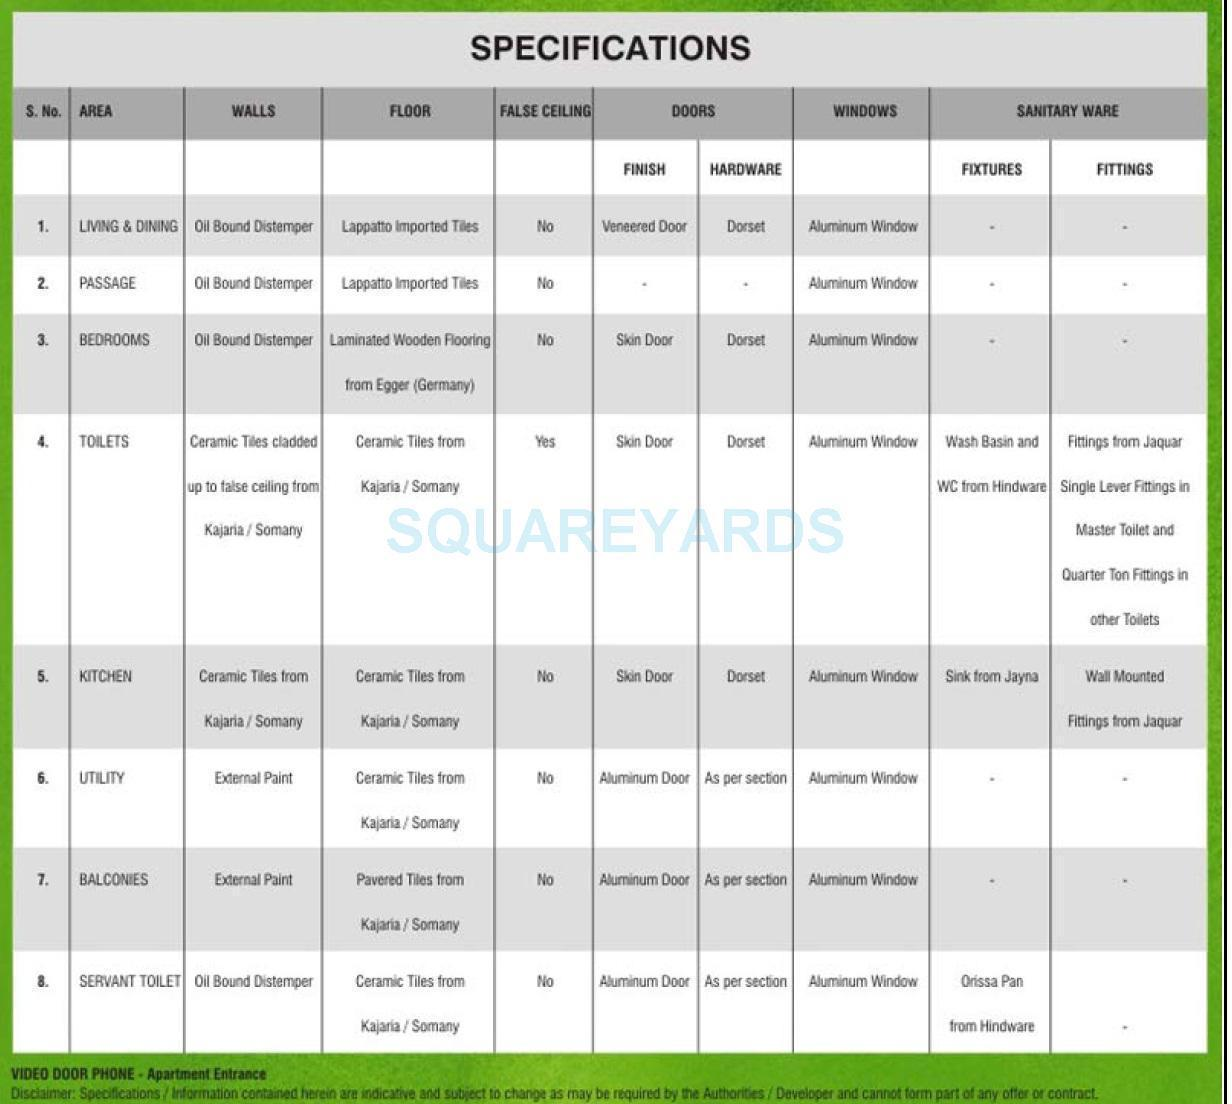 3c lotus boulevard espacia specification1